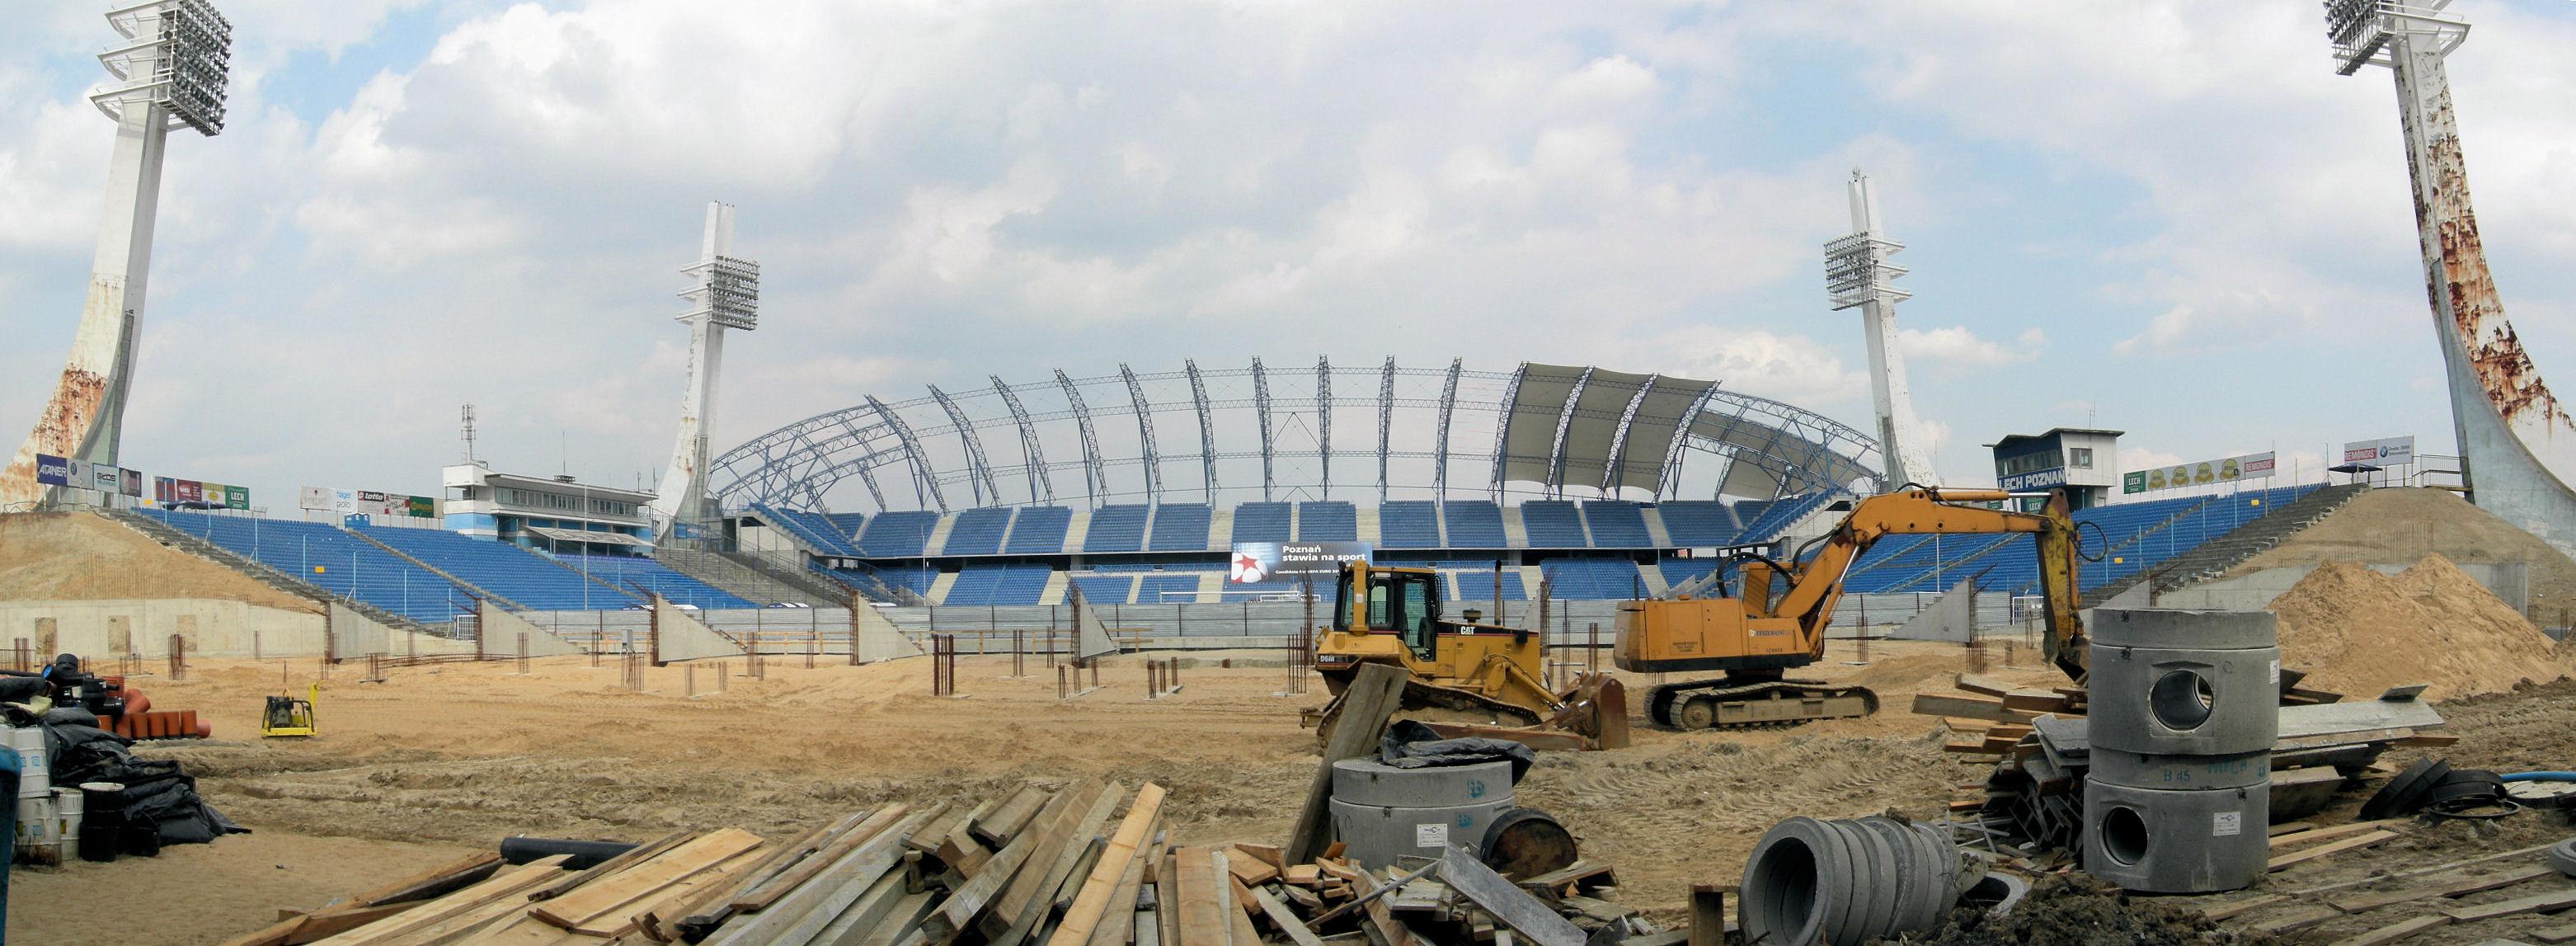 Lech Poznań Wikipedia: ملاعـب كأس الأمم الأوروببة 2012